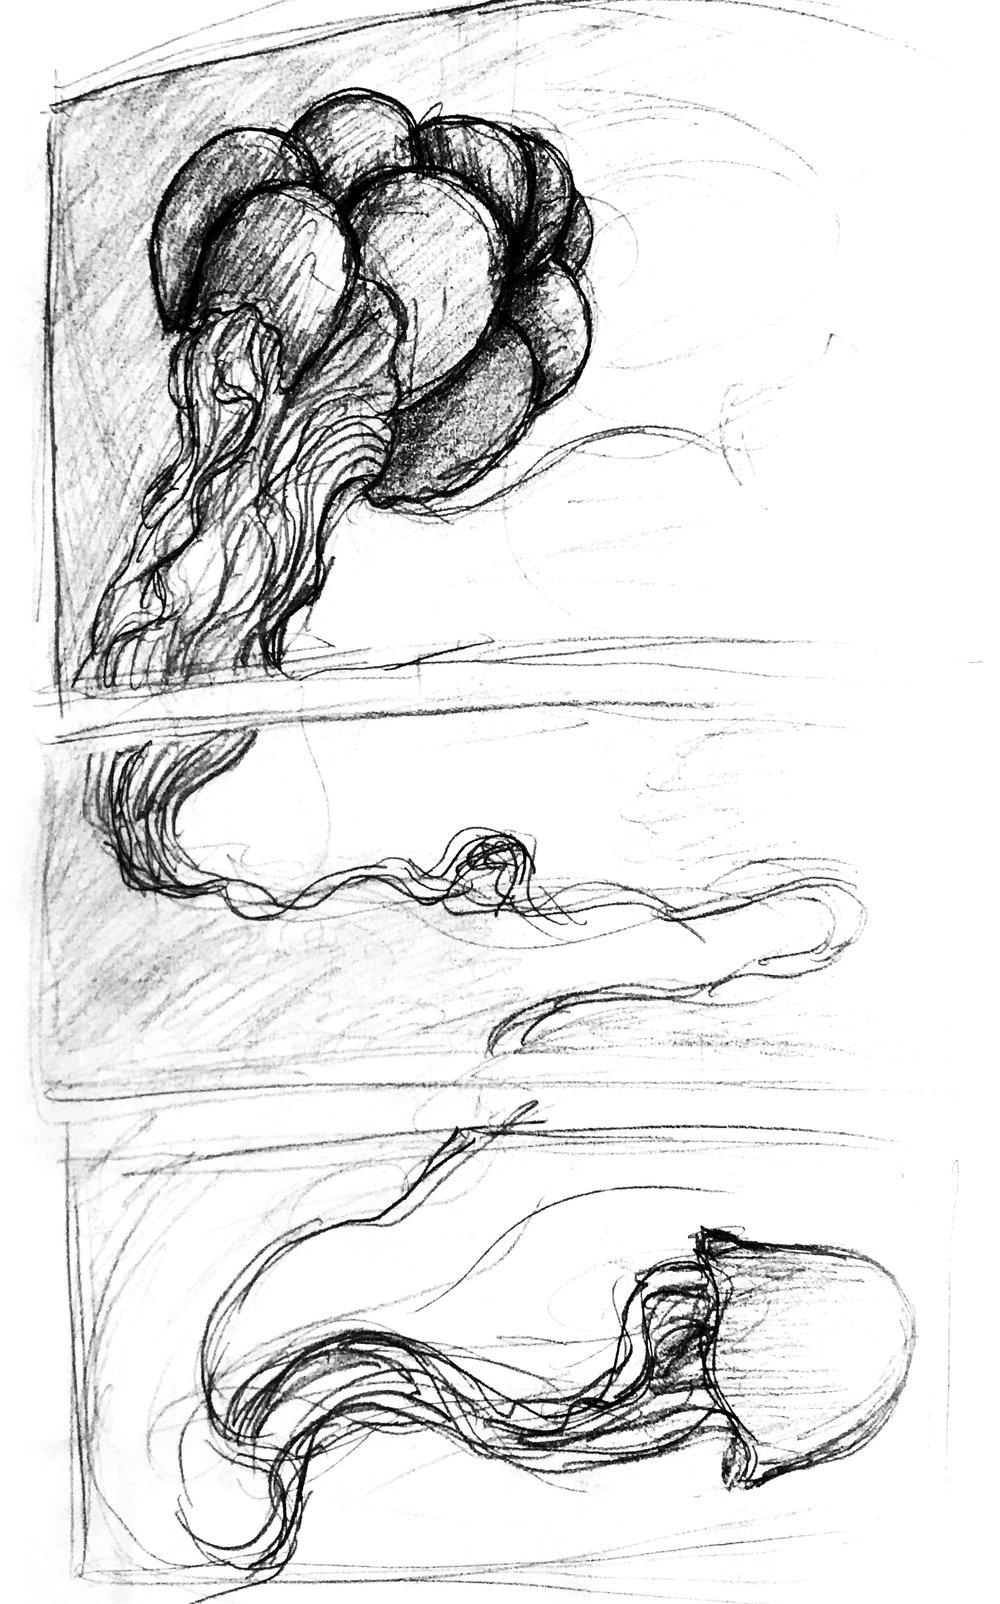 Sketch-Seascape-7.jpg